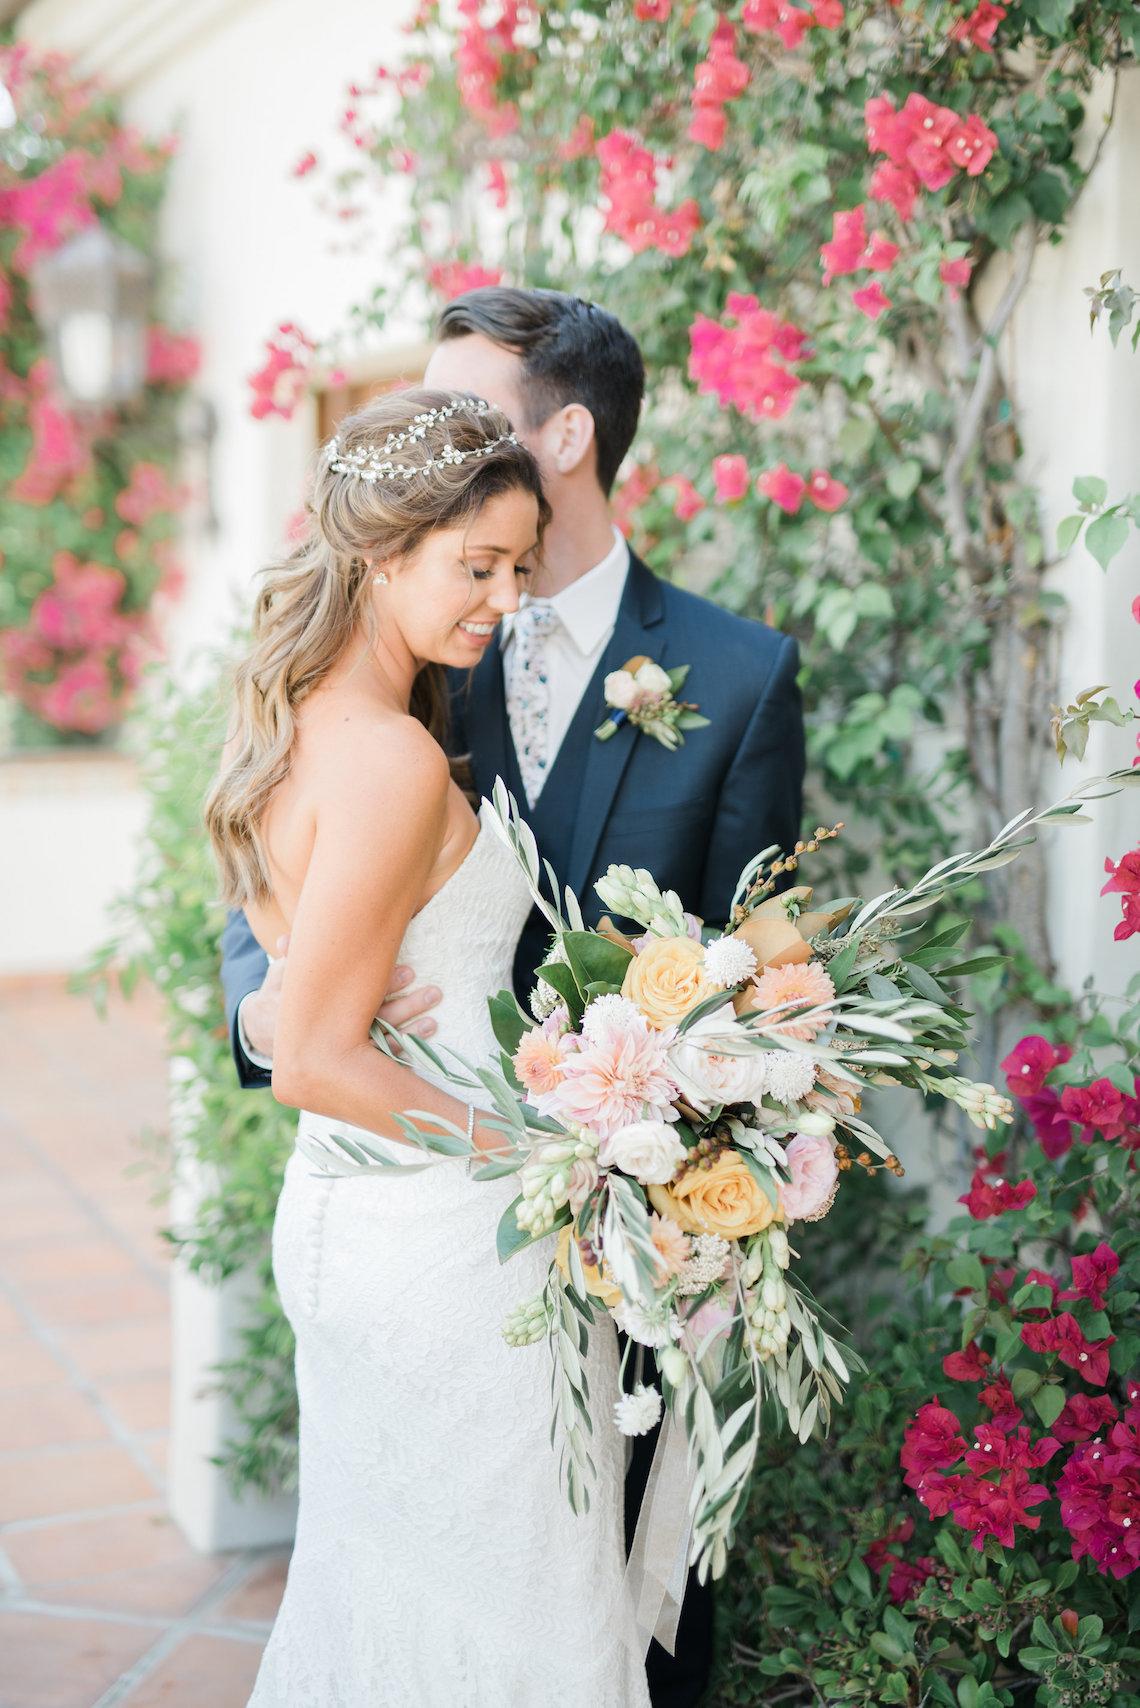 Upscale, Modern Ranch Wedding | Anya Kernes Photography 18